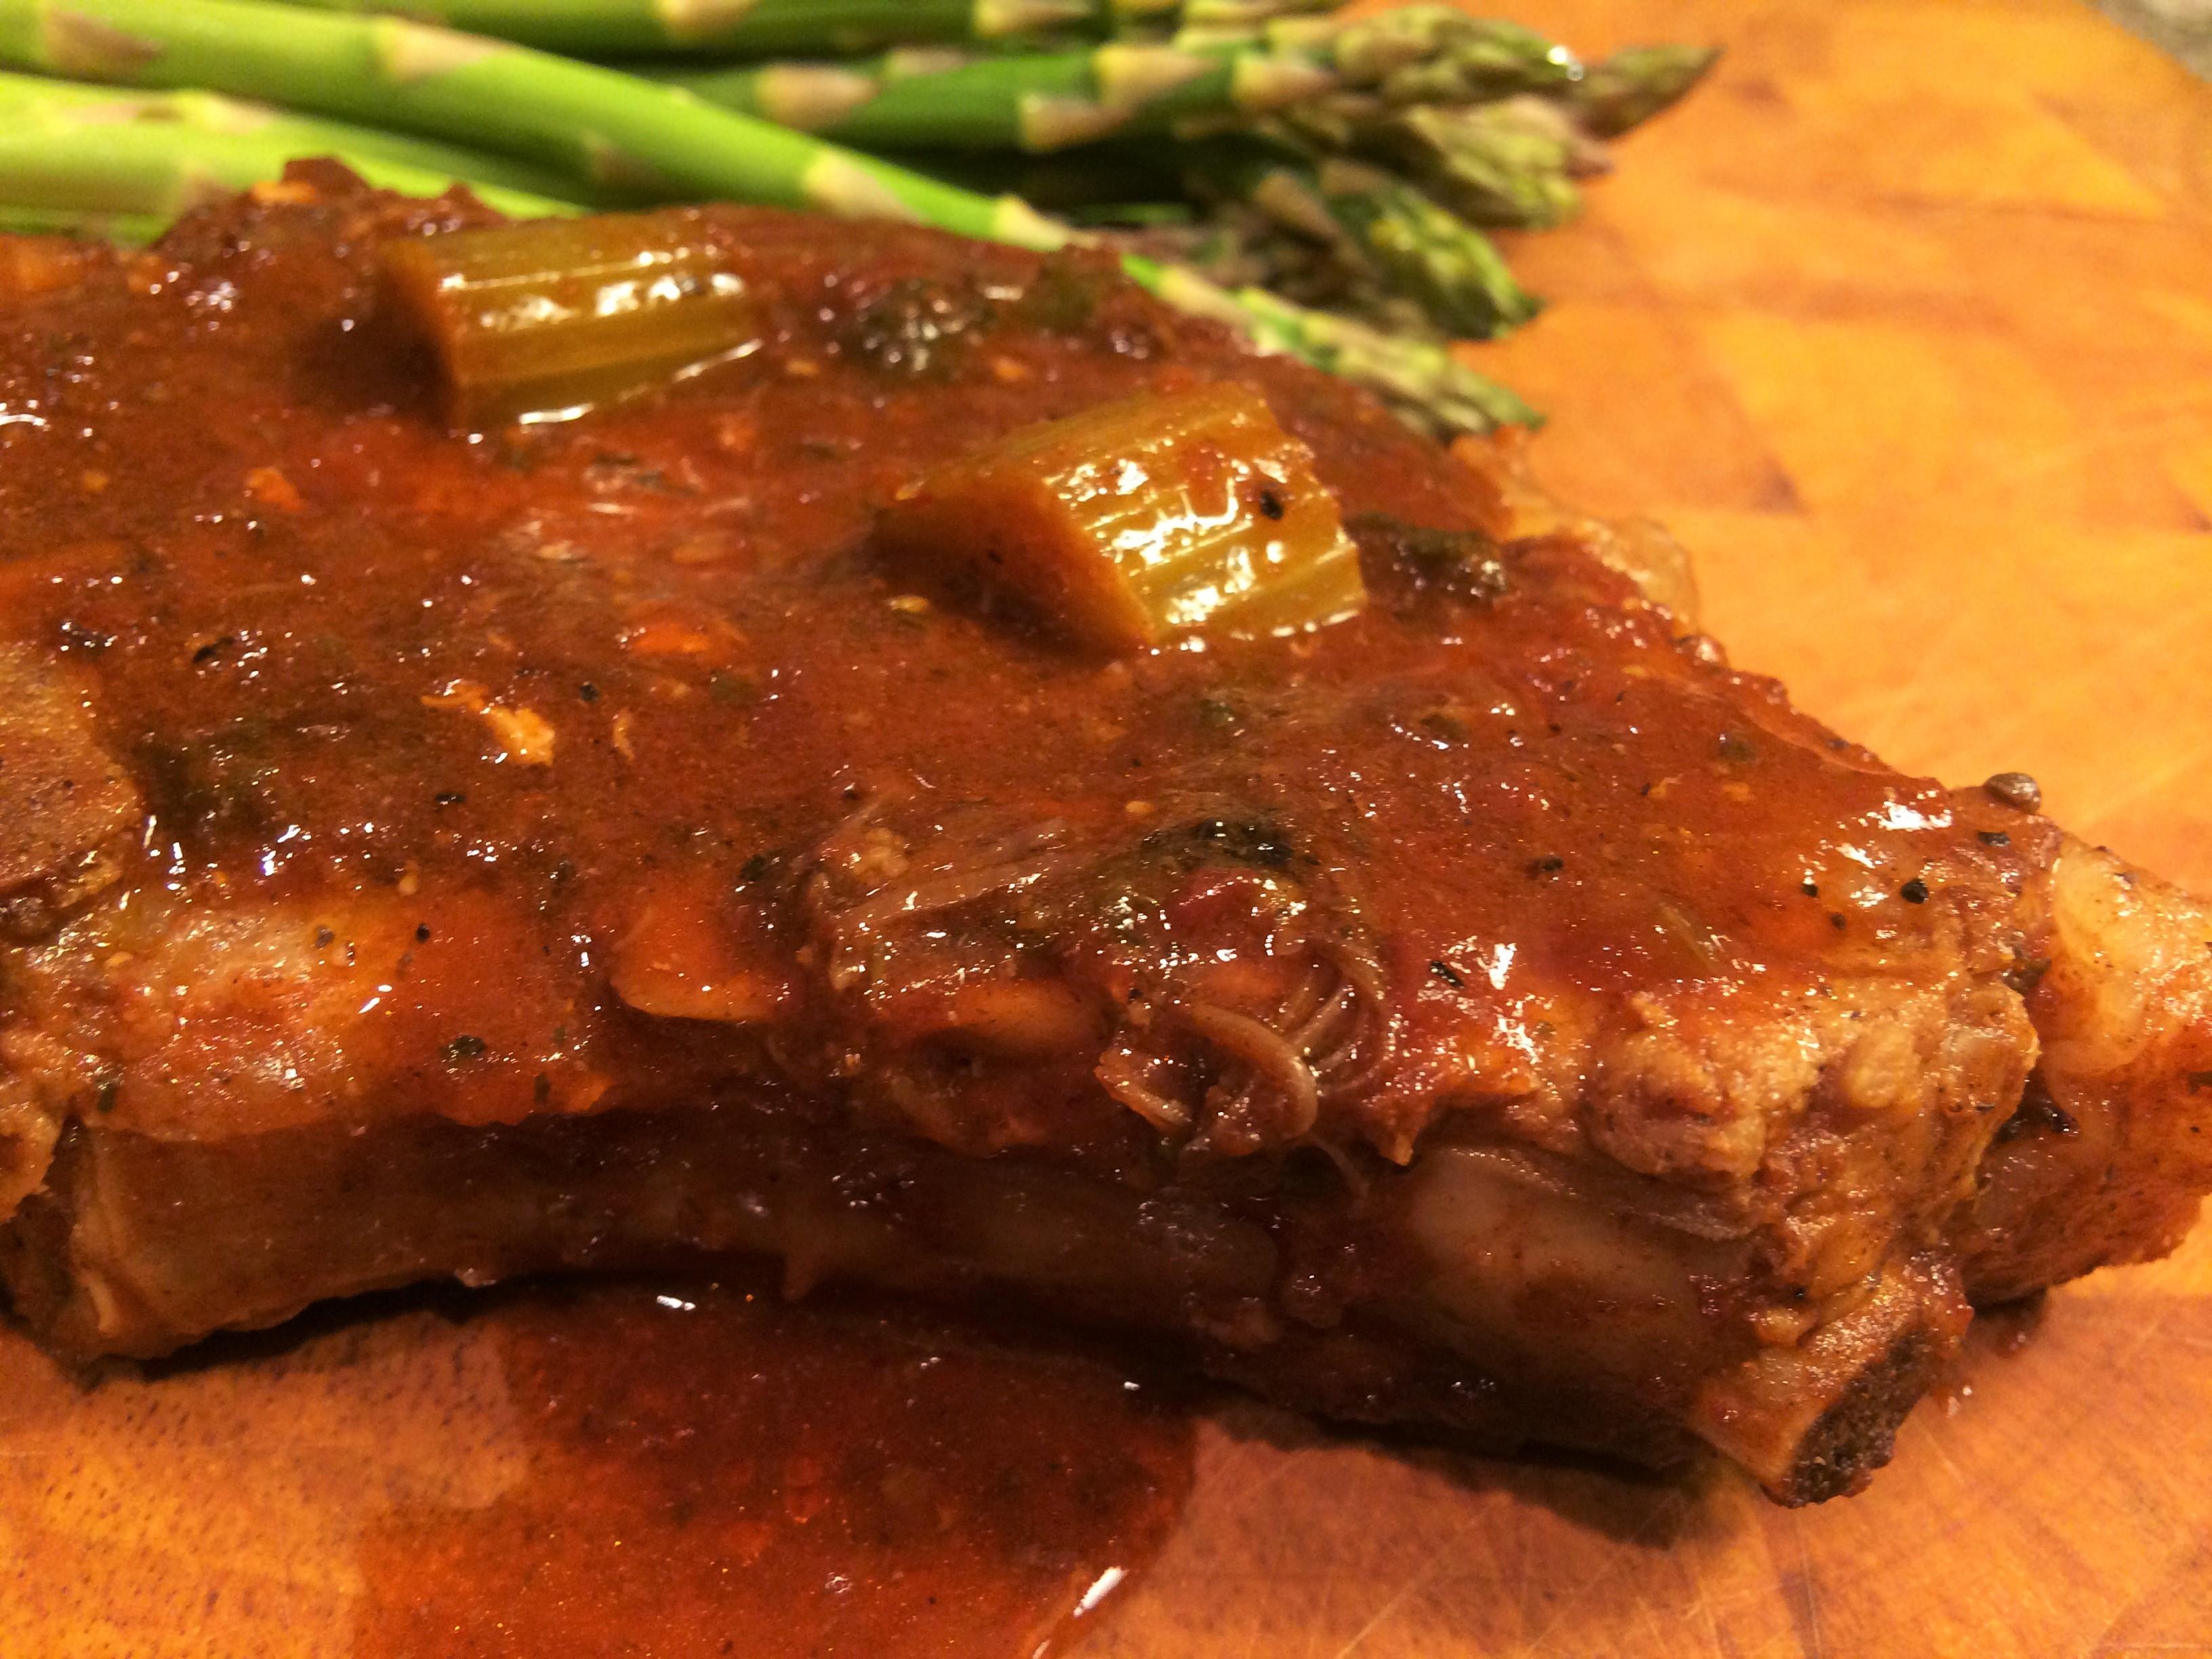 Paleo Pork Chops the Easy Way 5280meat - 1